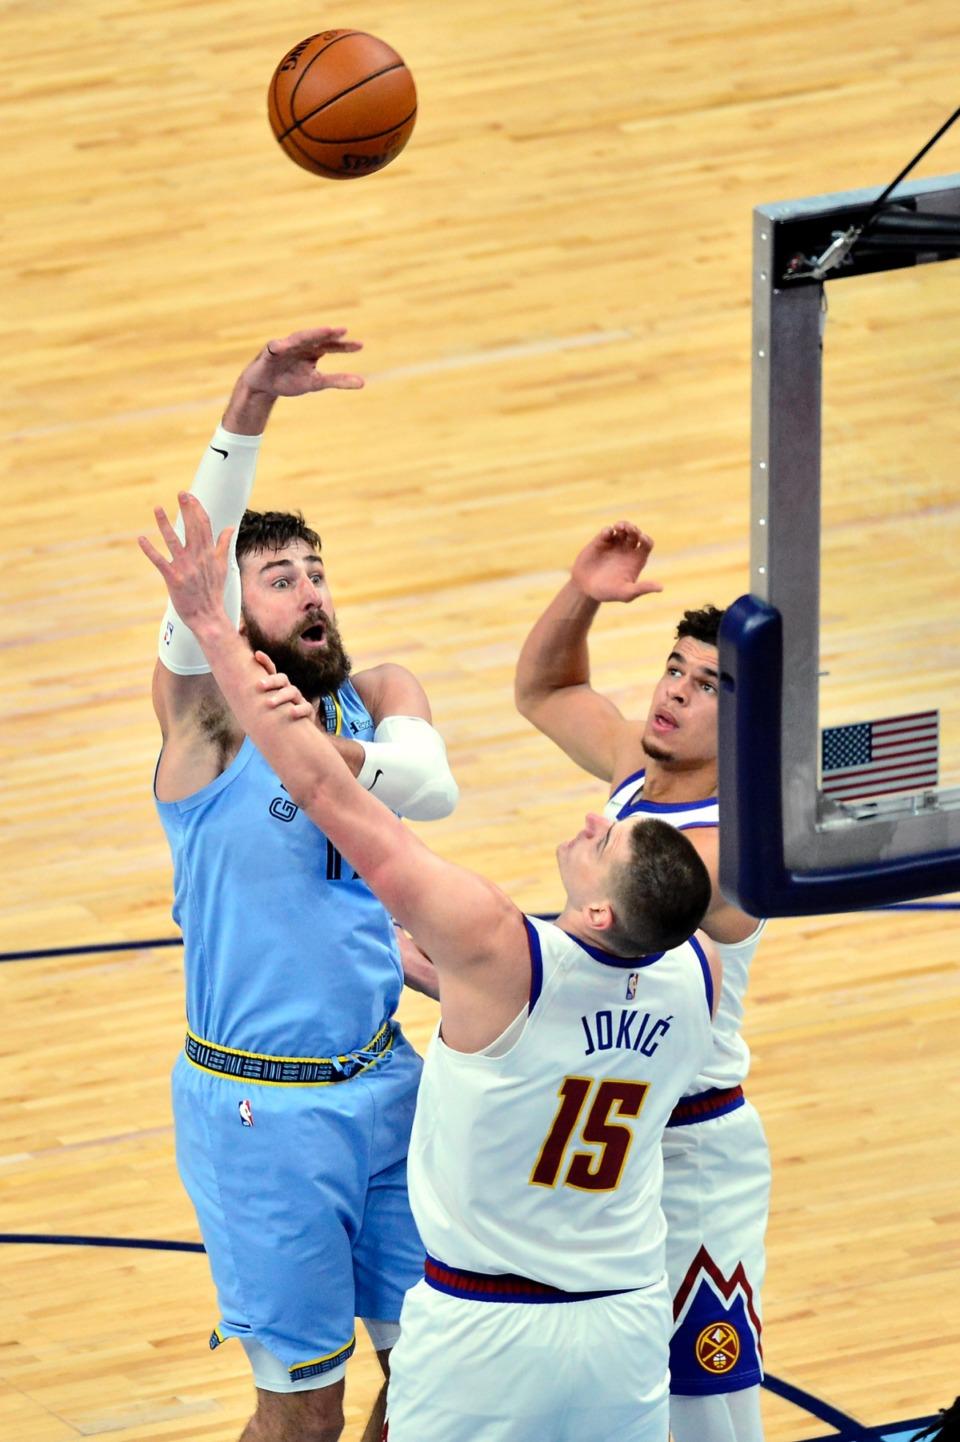 <strong>Memphis Grizzlies center Jonas Valanciunas (17) shoots against Denver Nuggets center Nikola Jokic (15) and forward Michael Porter Jr.&nbsp;on March 12 at FedExForum.</strong> (Brandon Dill/AP)